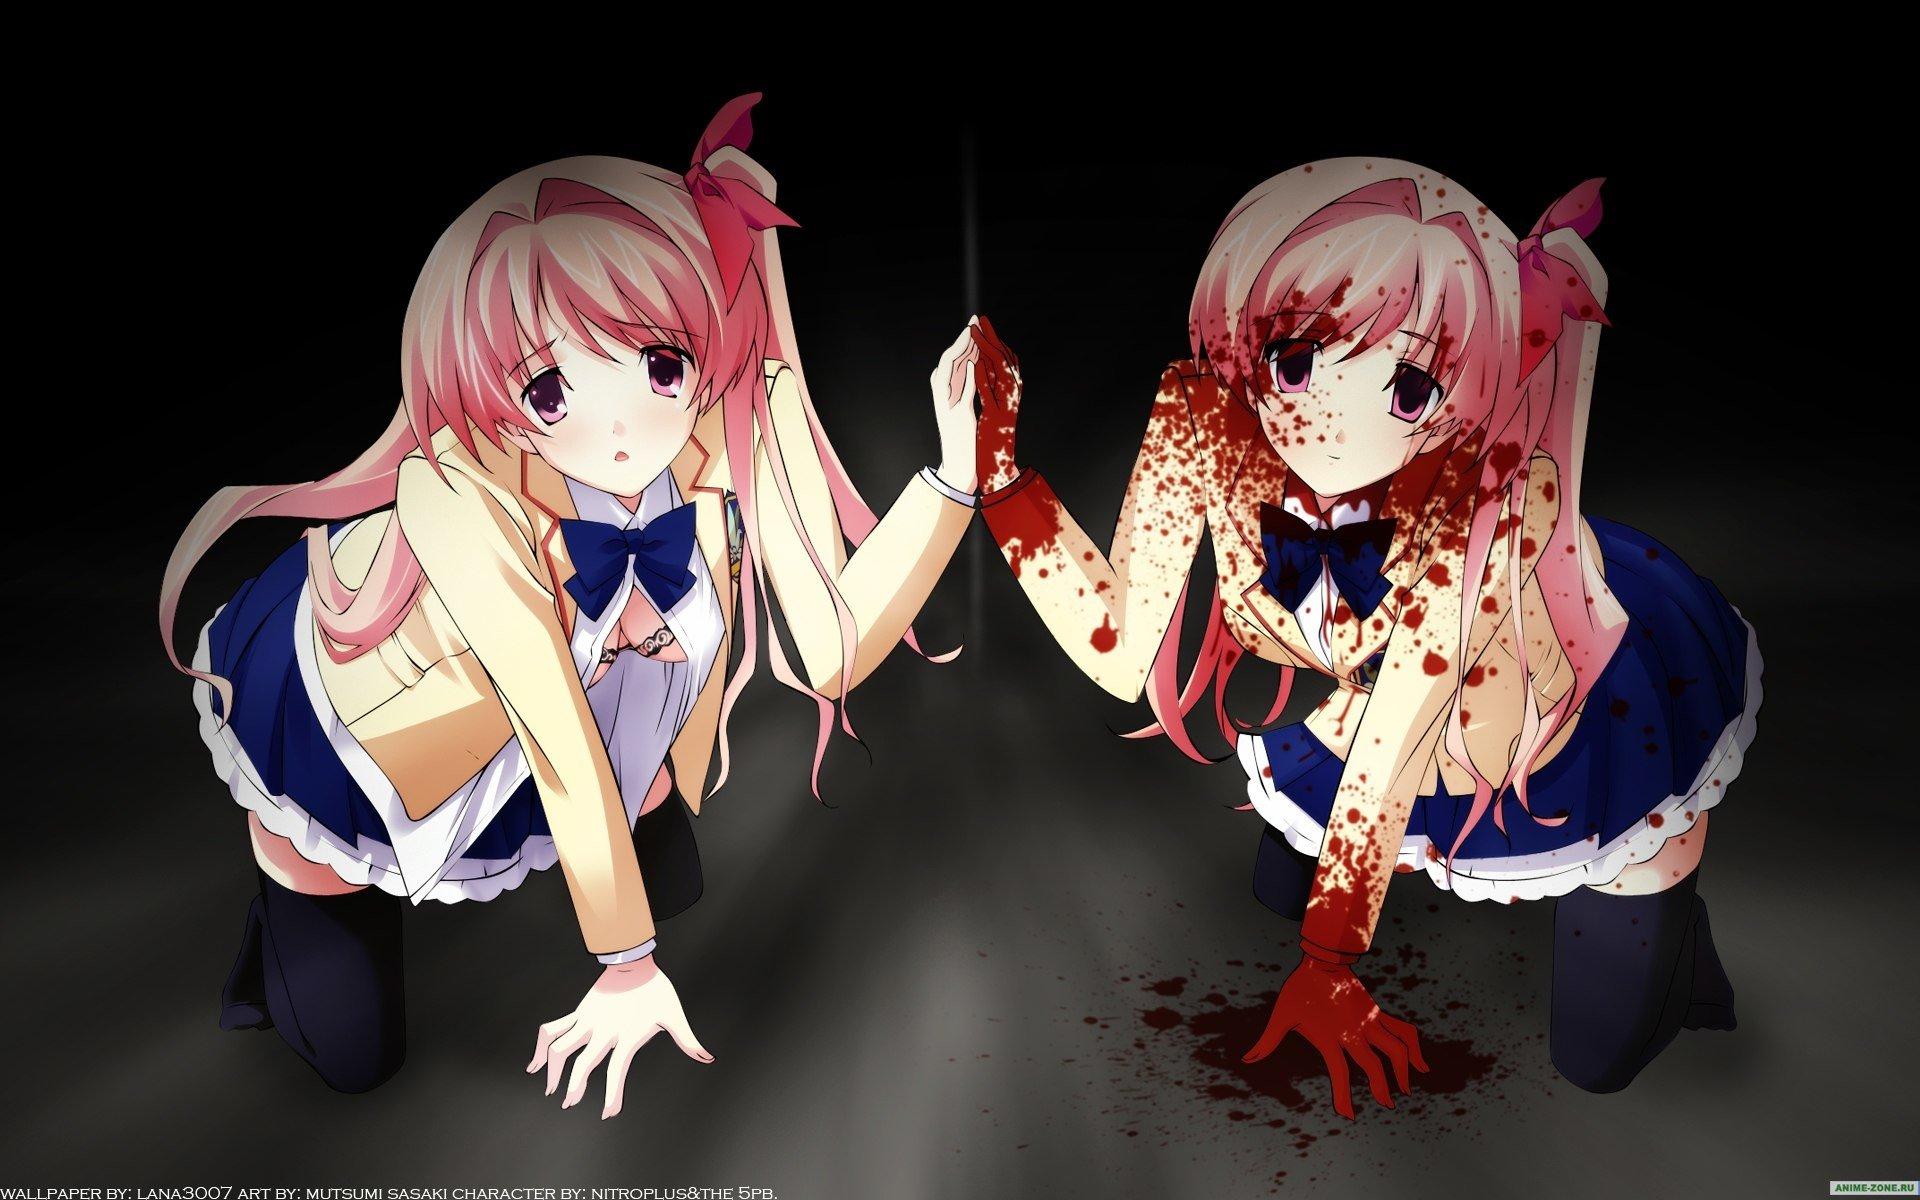 Anime - Chaos;Head  Wallpaper